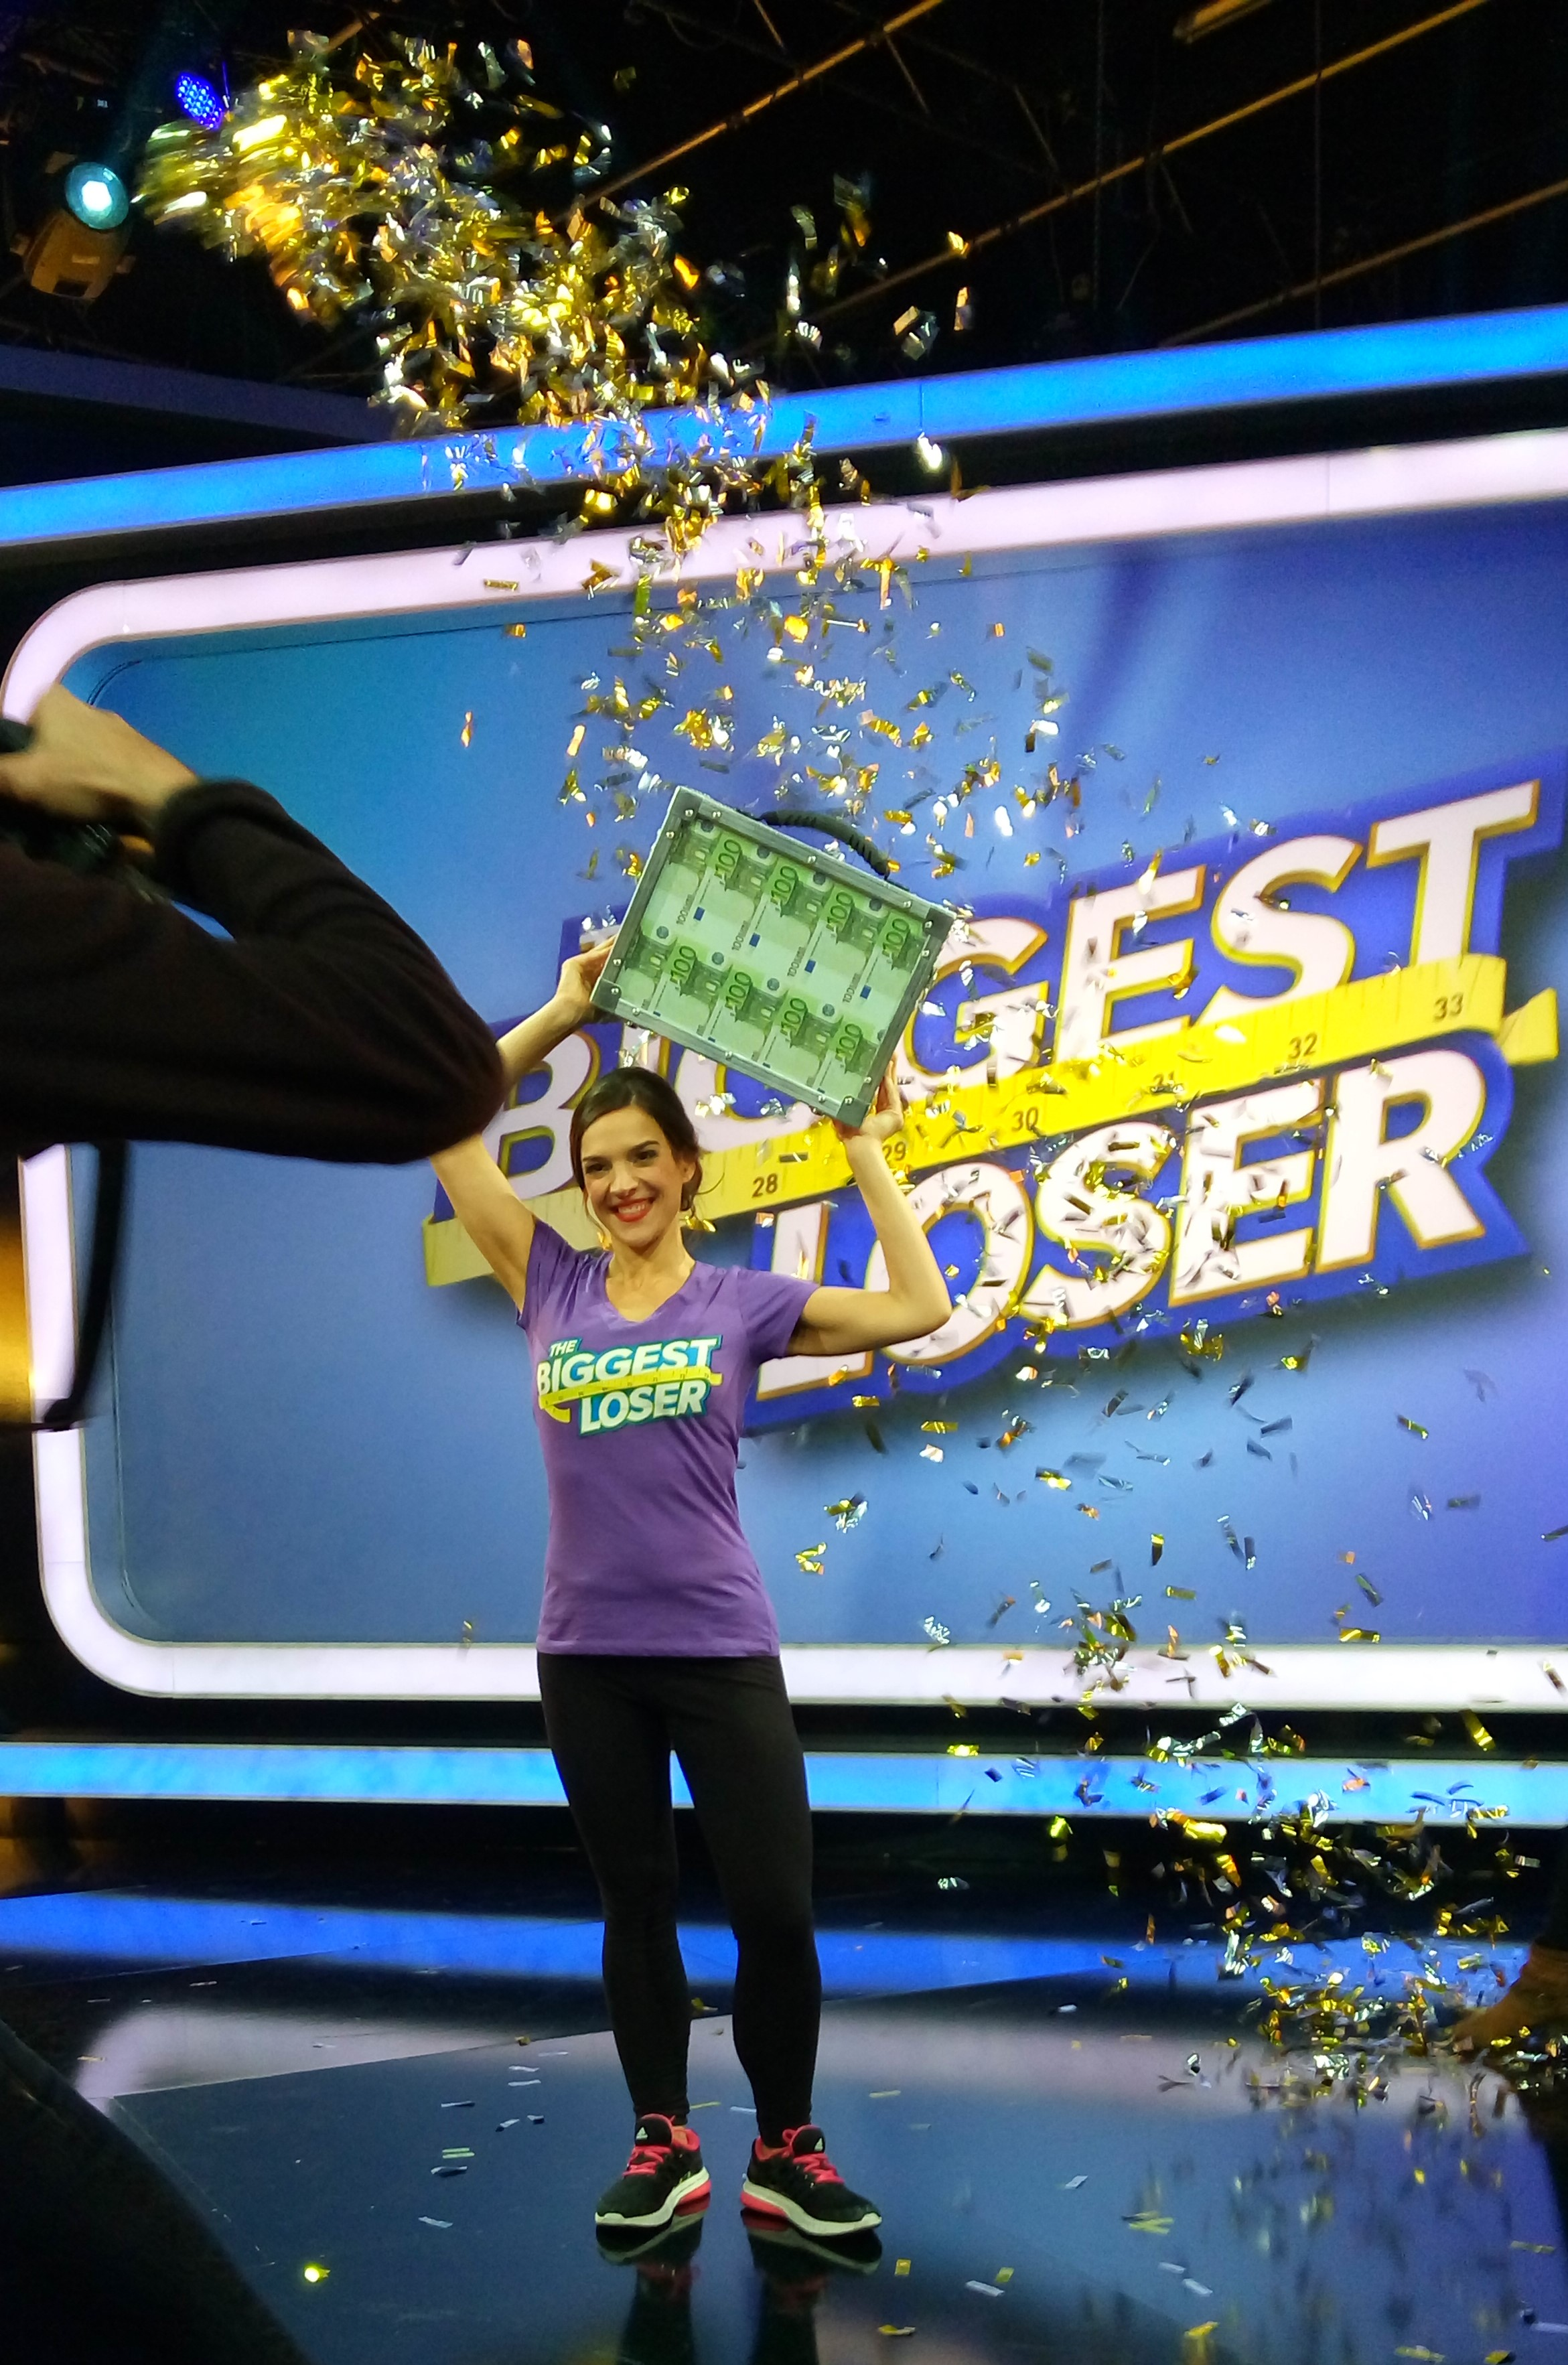 Gewinnerin Alexandra - The Biggest Loser 2017 !!